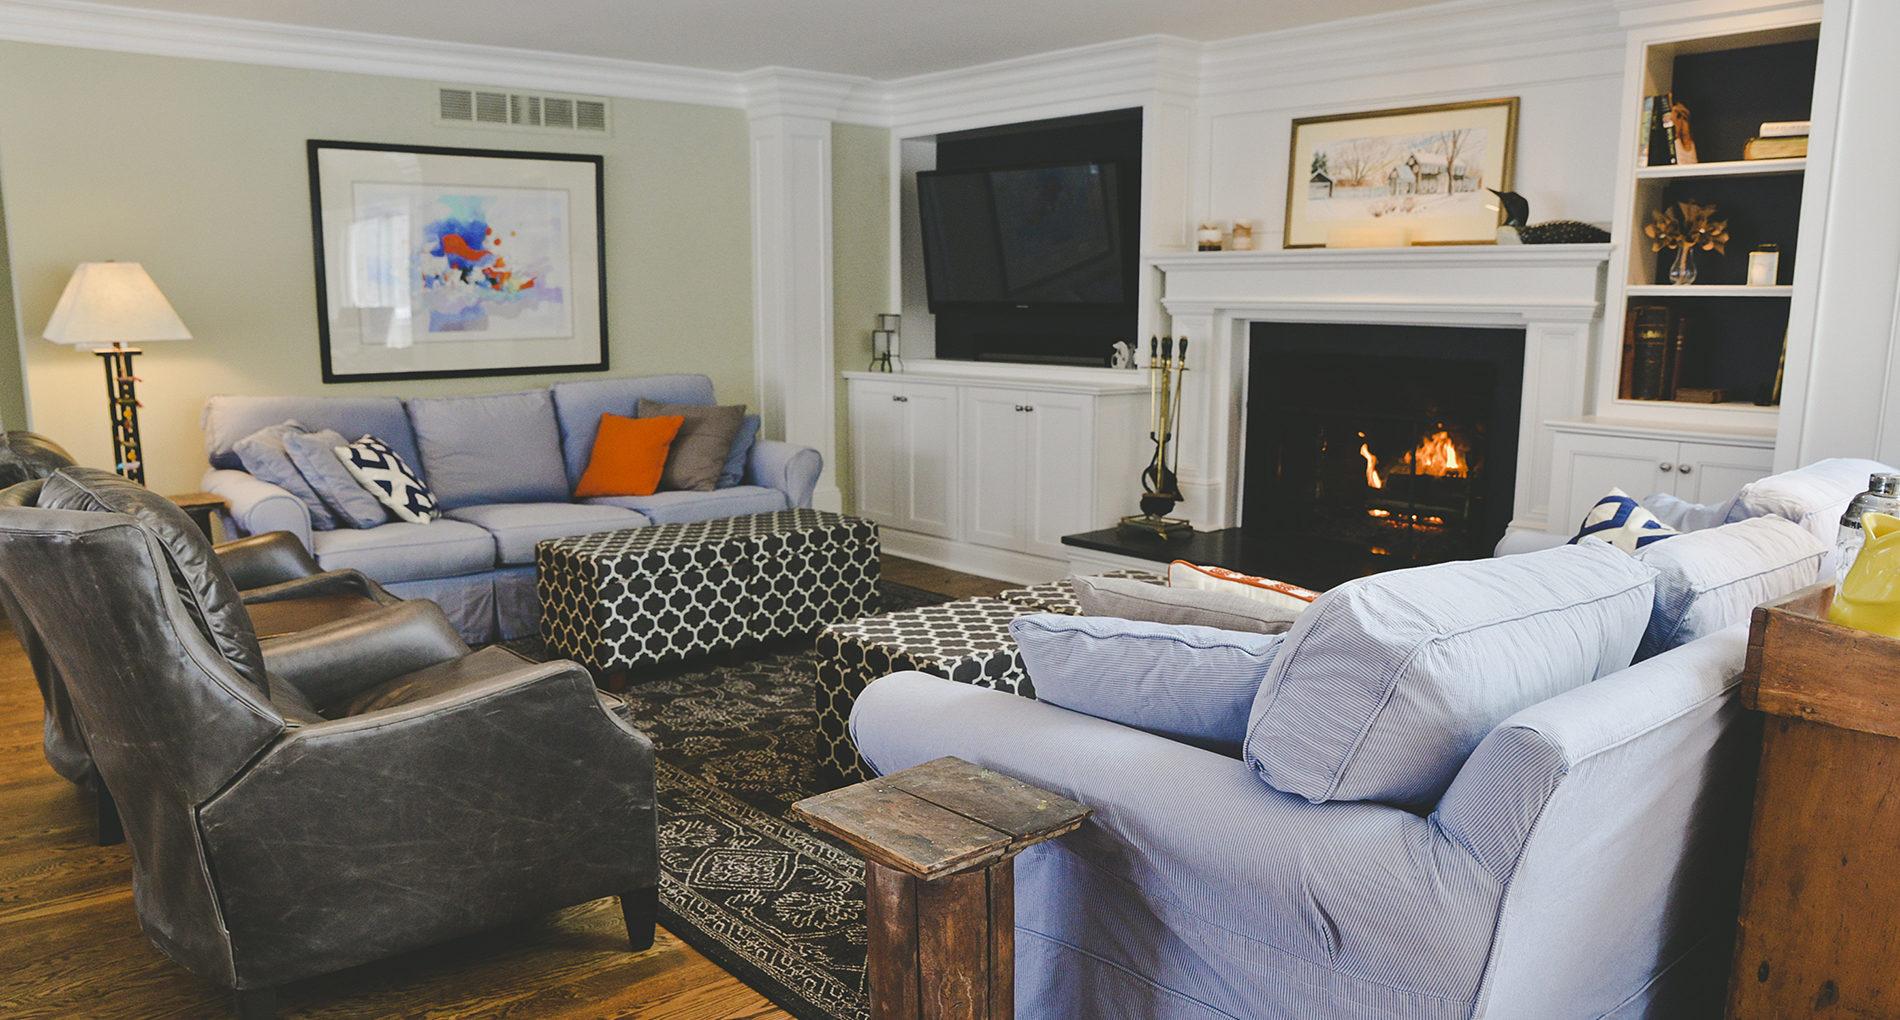 Alair Cuyahoga Falls Living Room Renovation 52